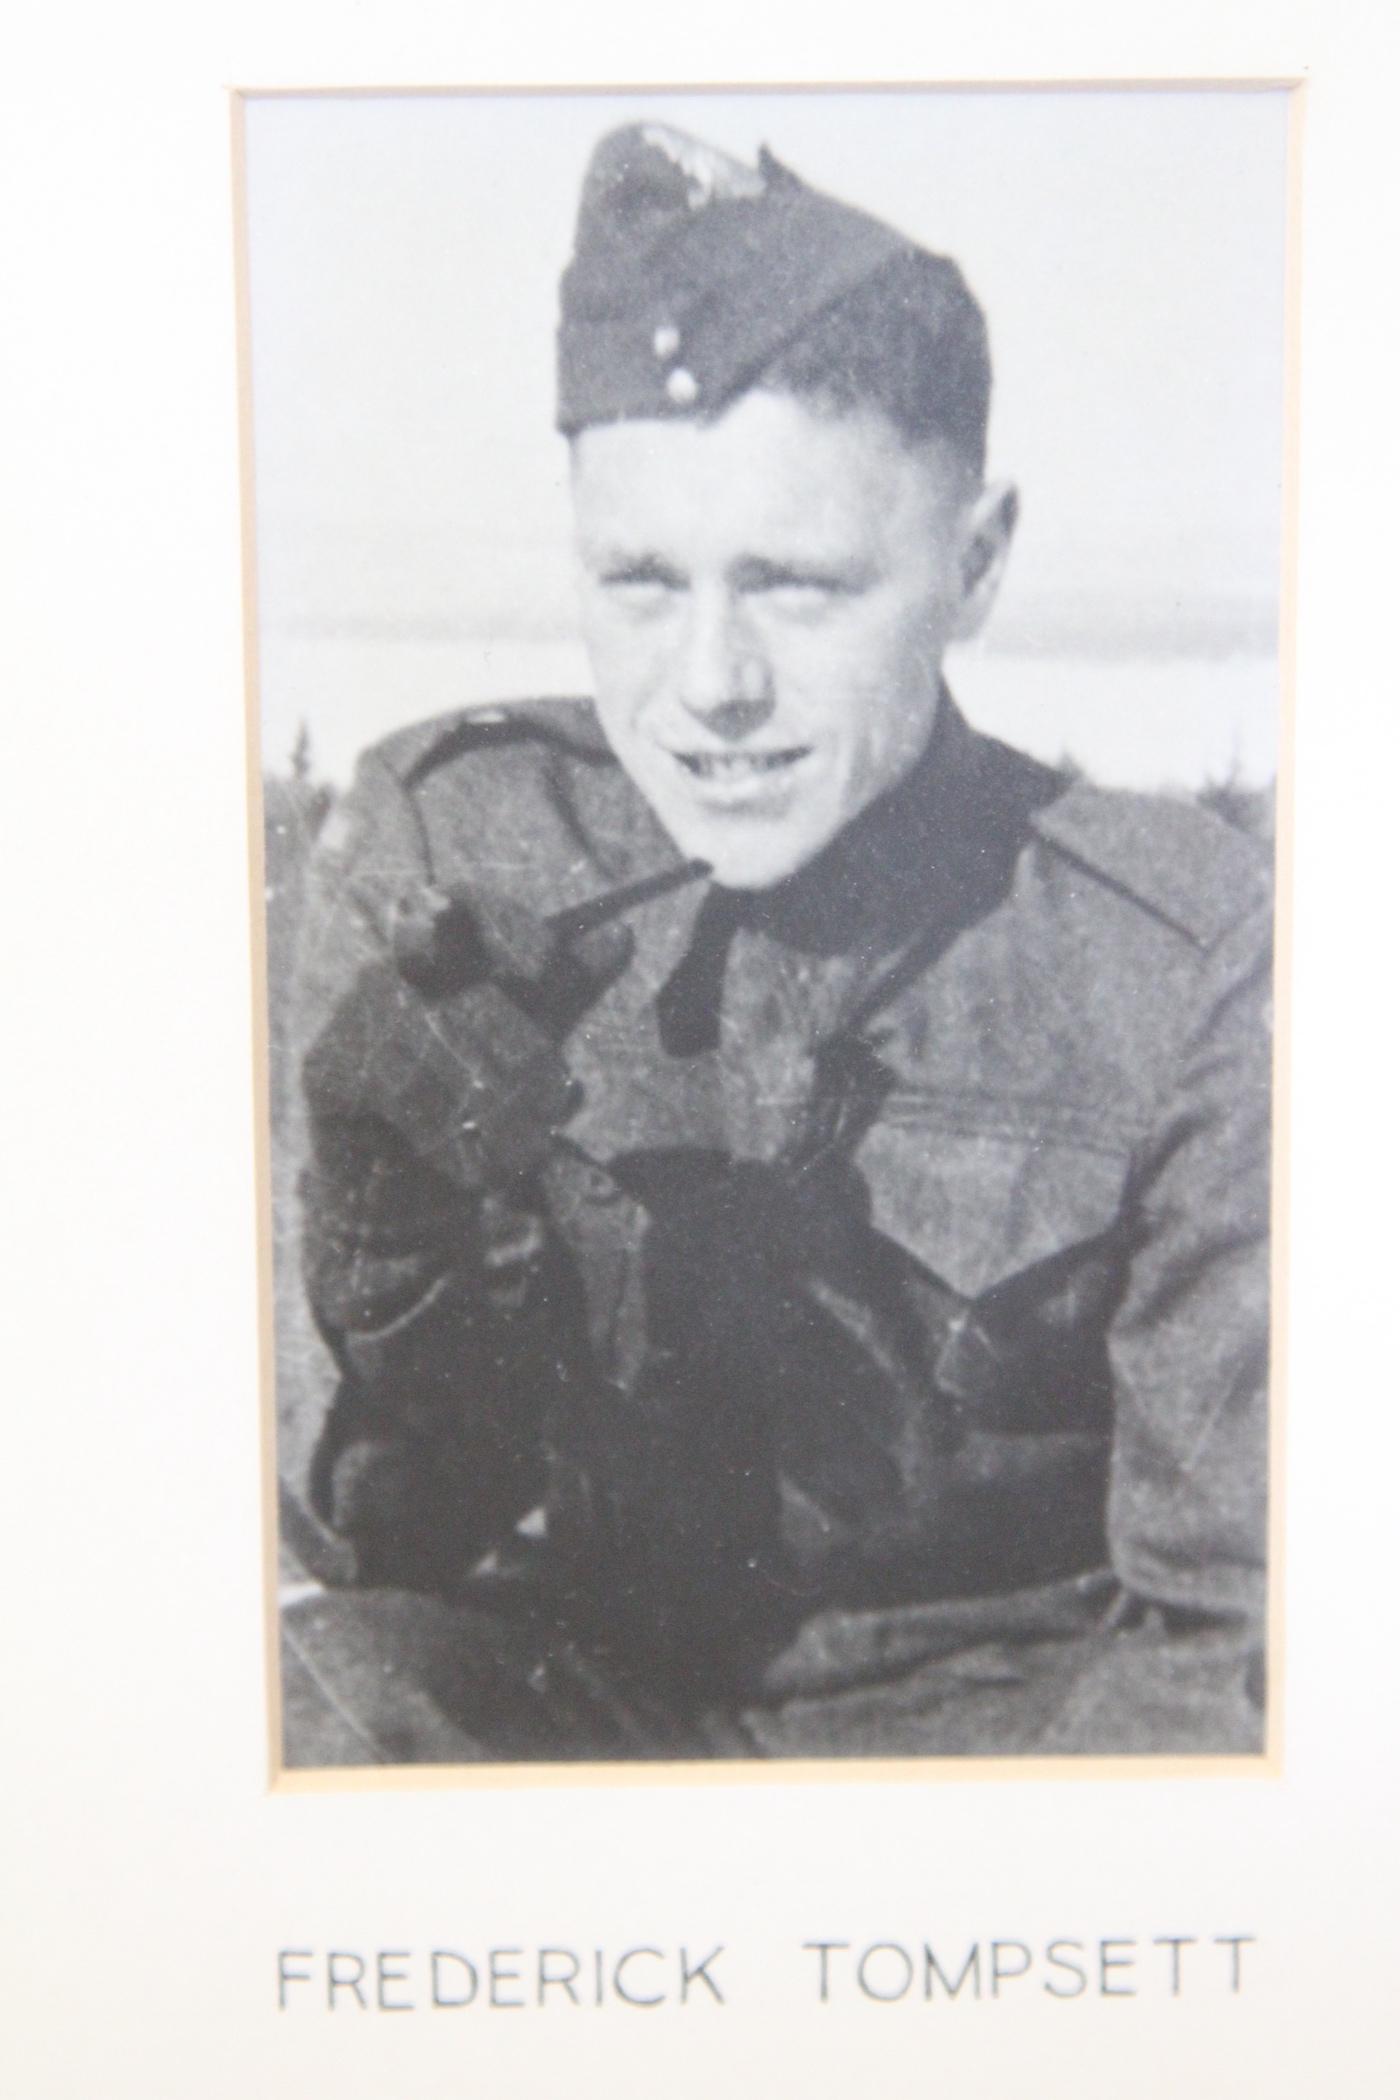 Photo of FREDERICK TOMPSETT